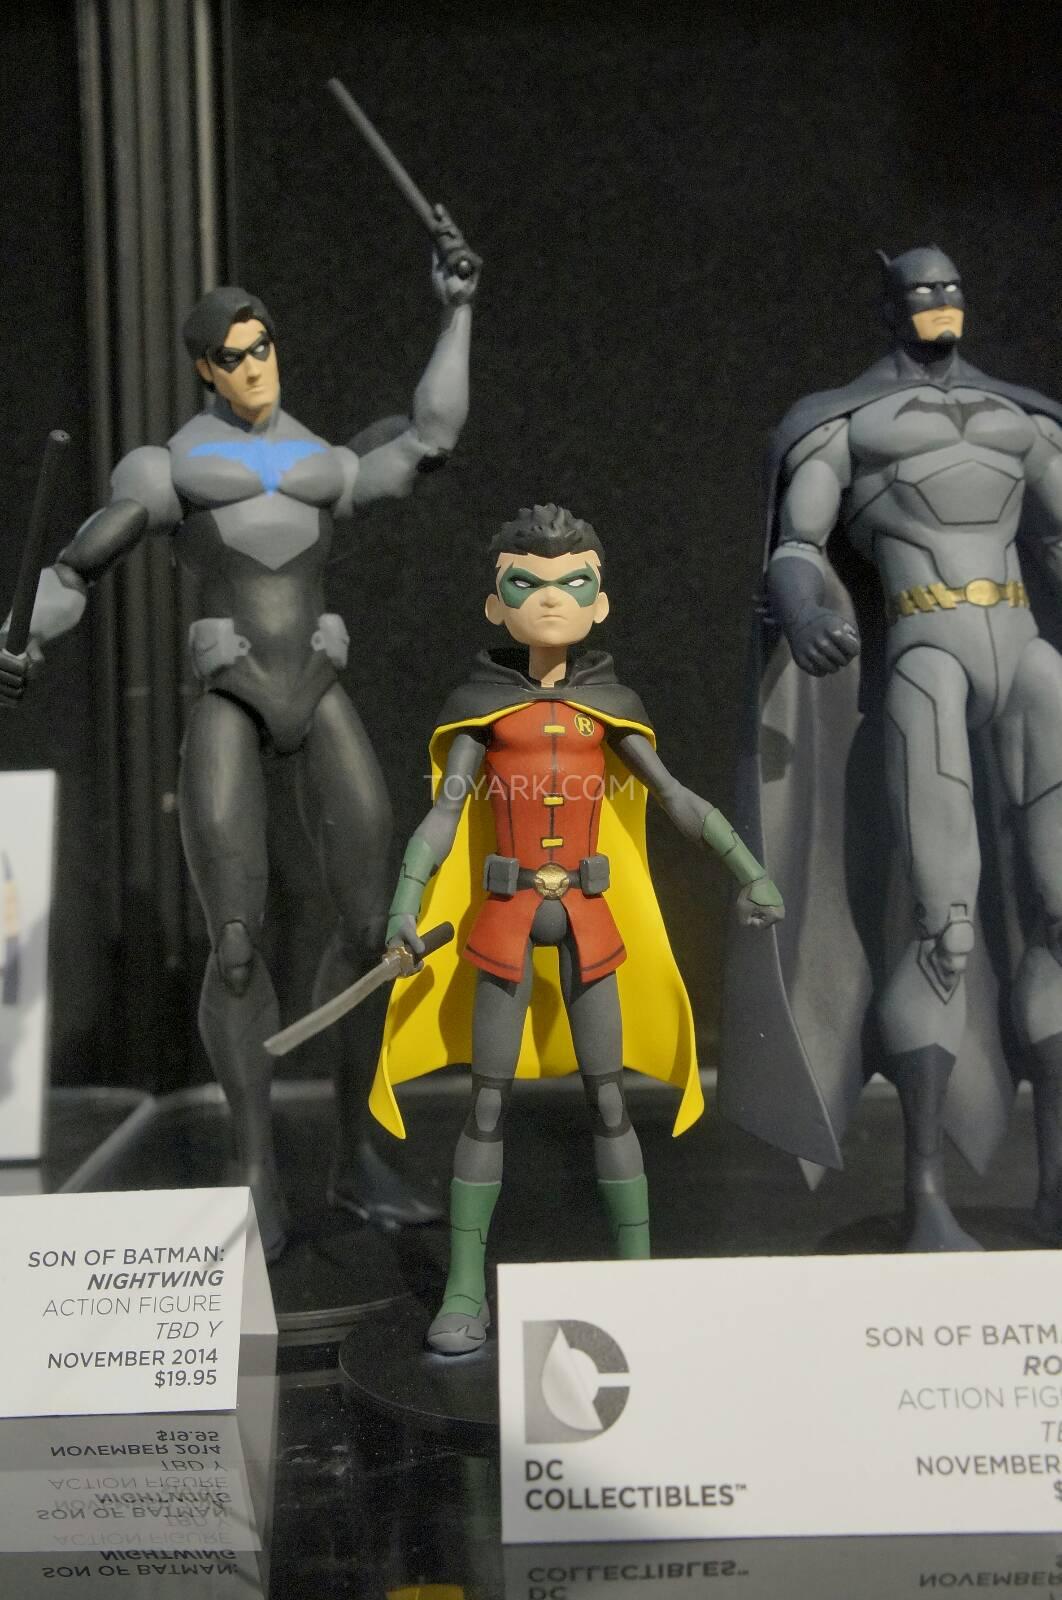 [Toy Fair 2014] DC Collectibles Toy-Fair-2014-DC-Collectibles-106